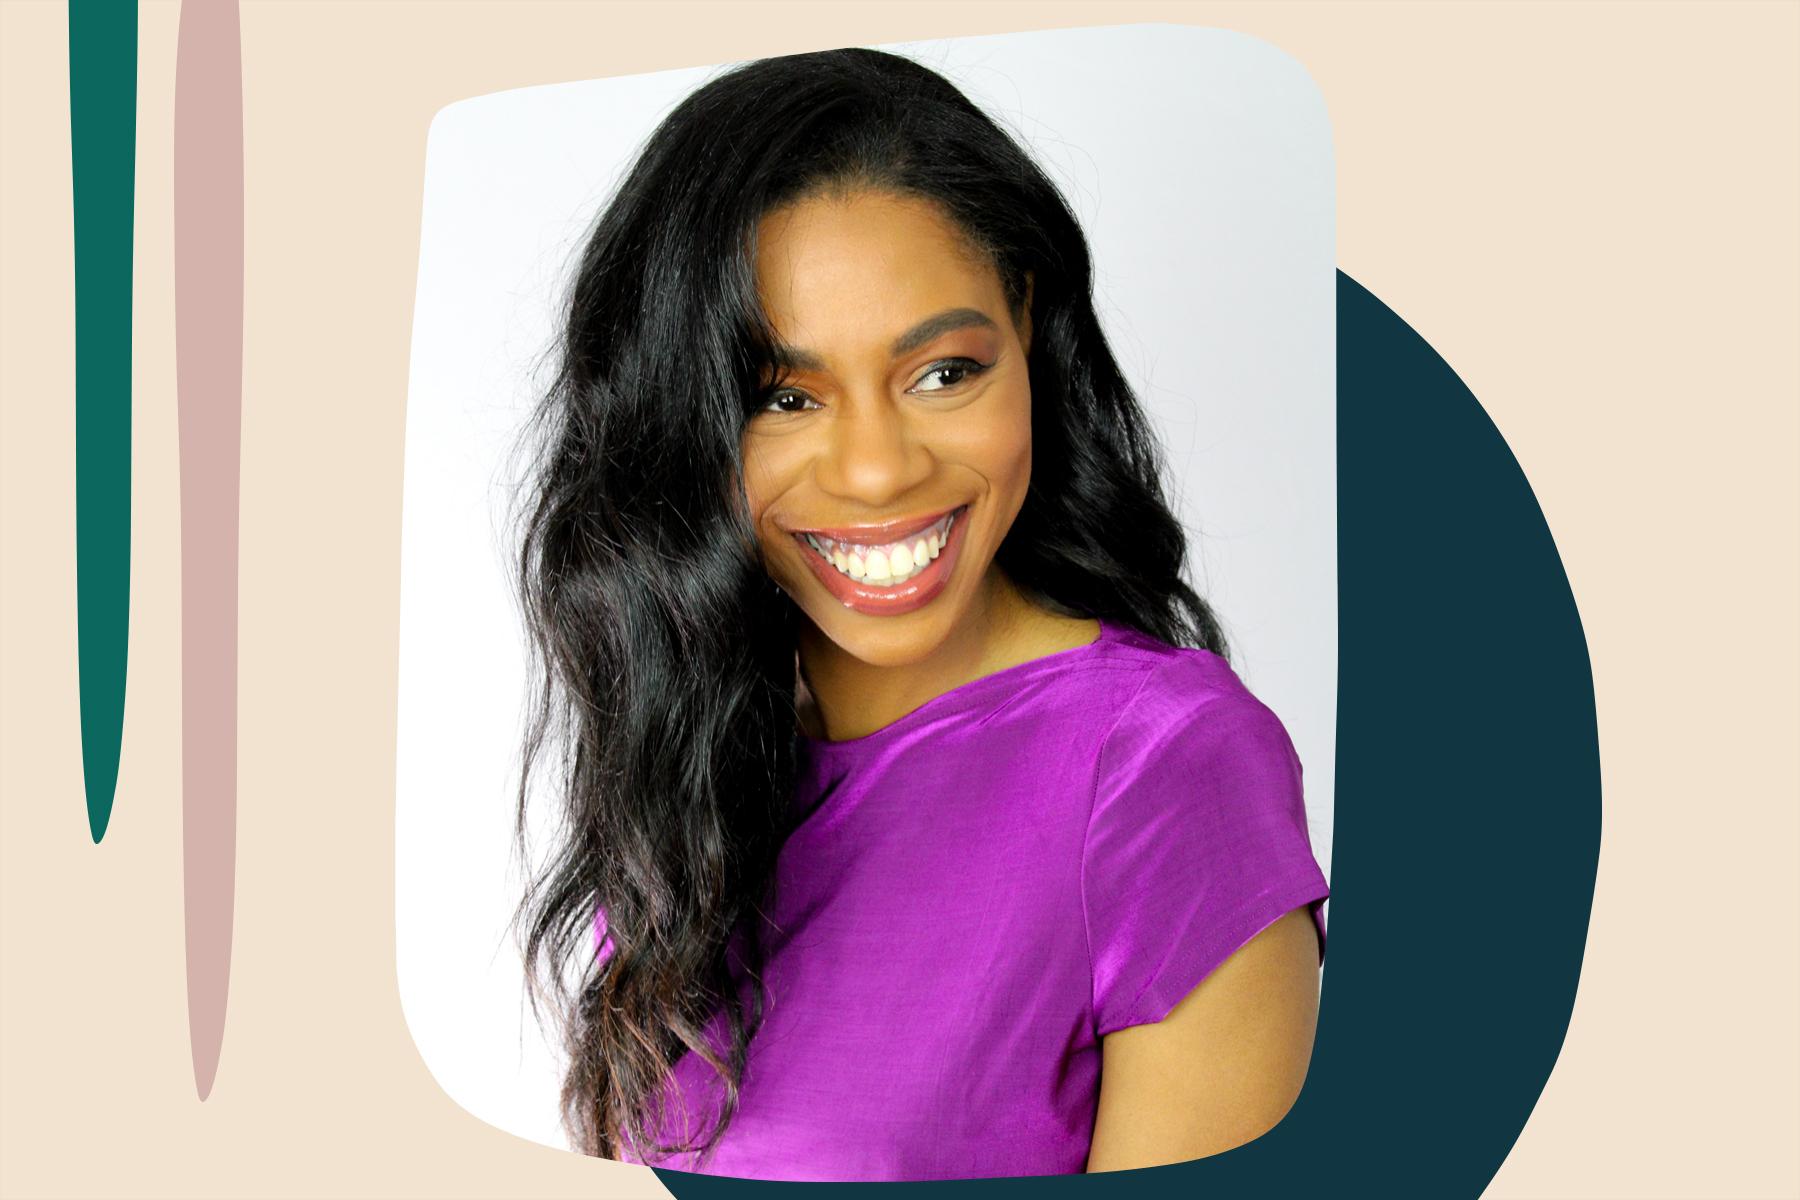 black women can have long hair, natural hair